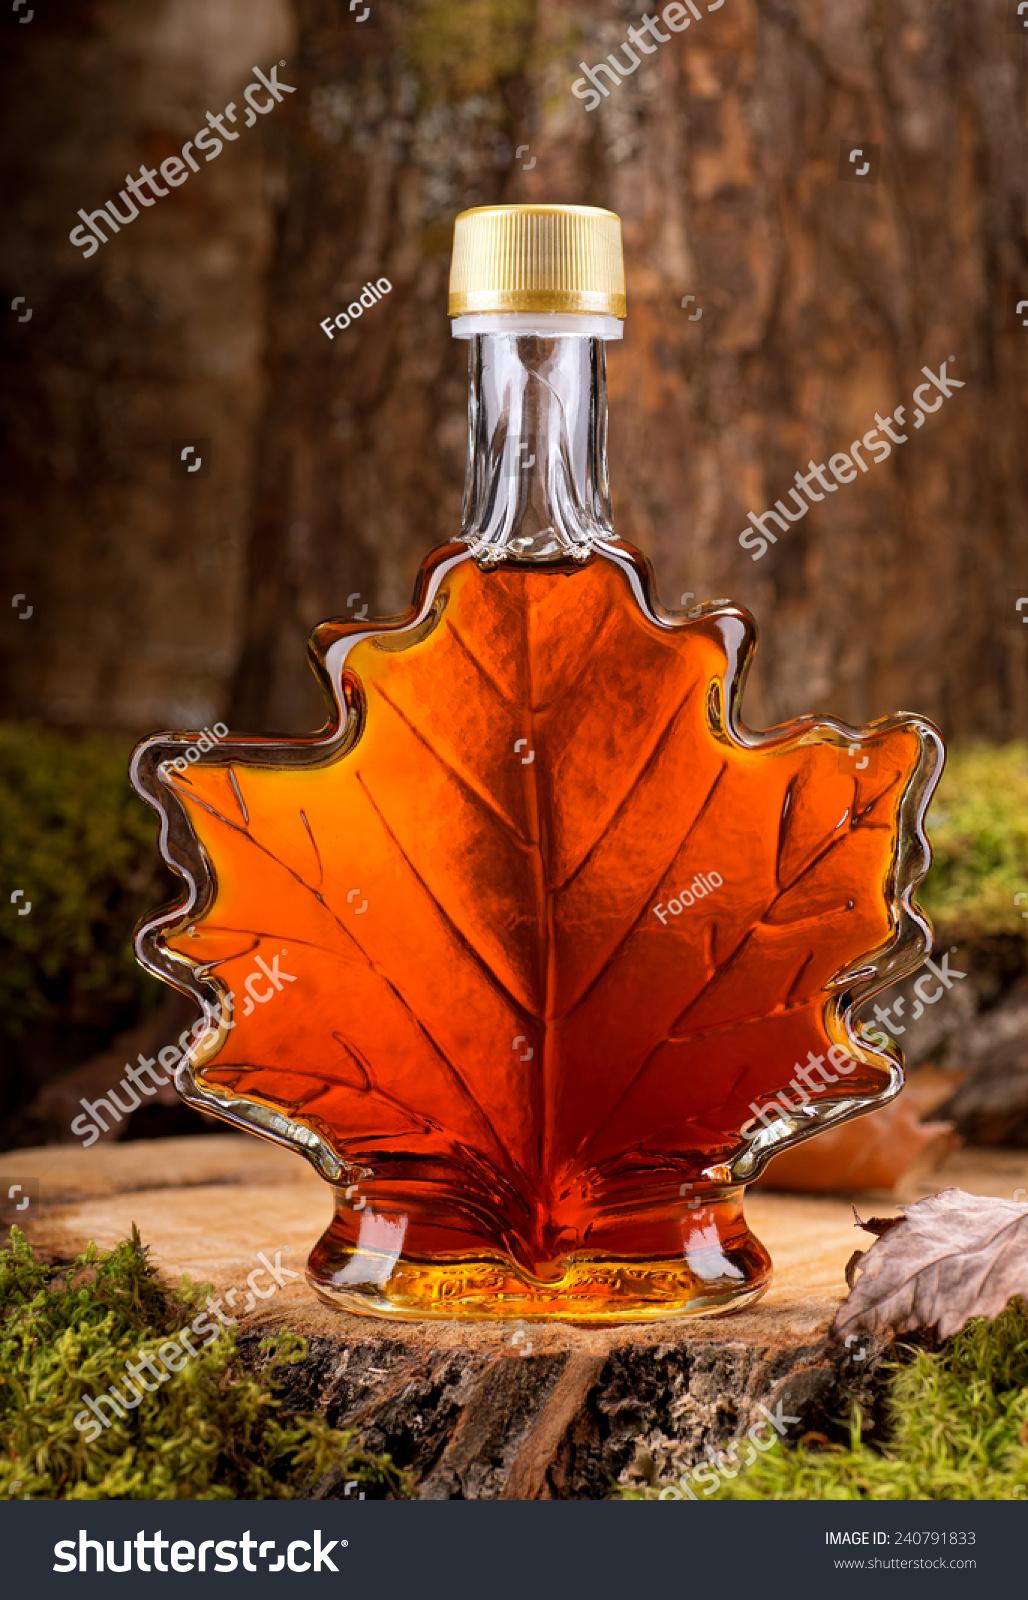 bottle delicious maple syrup hardwood forest stock photo 240791833